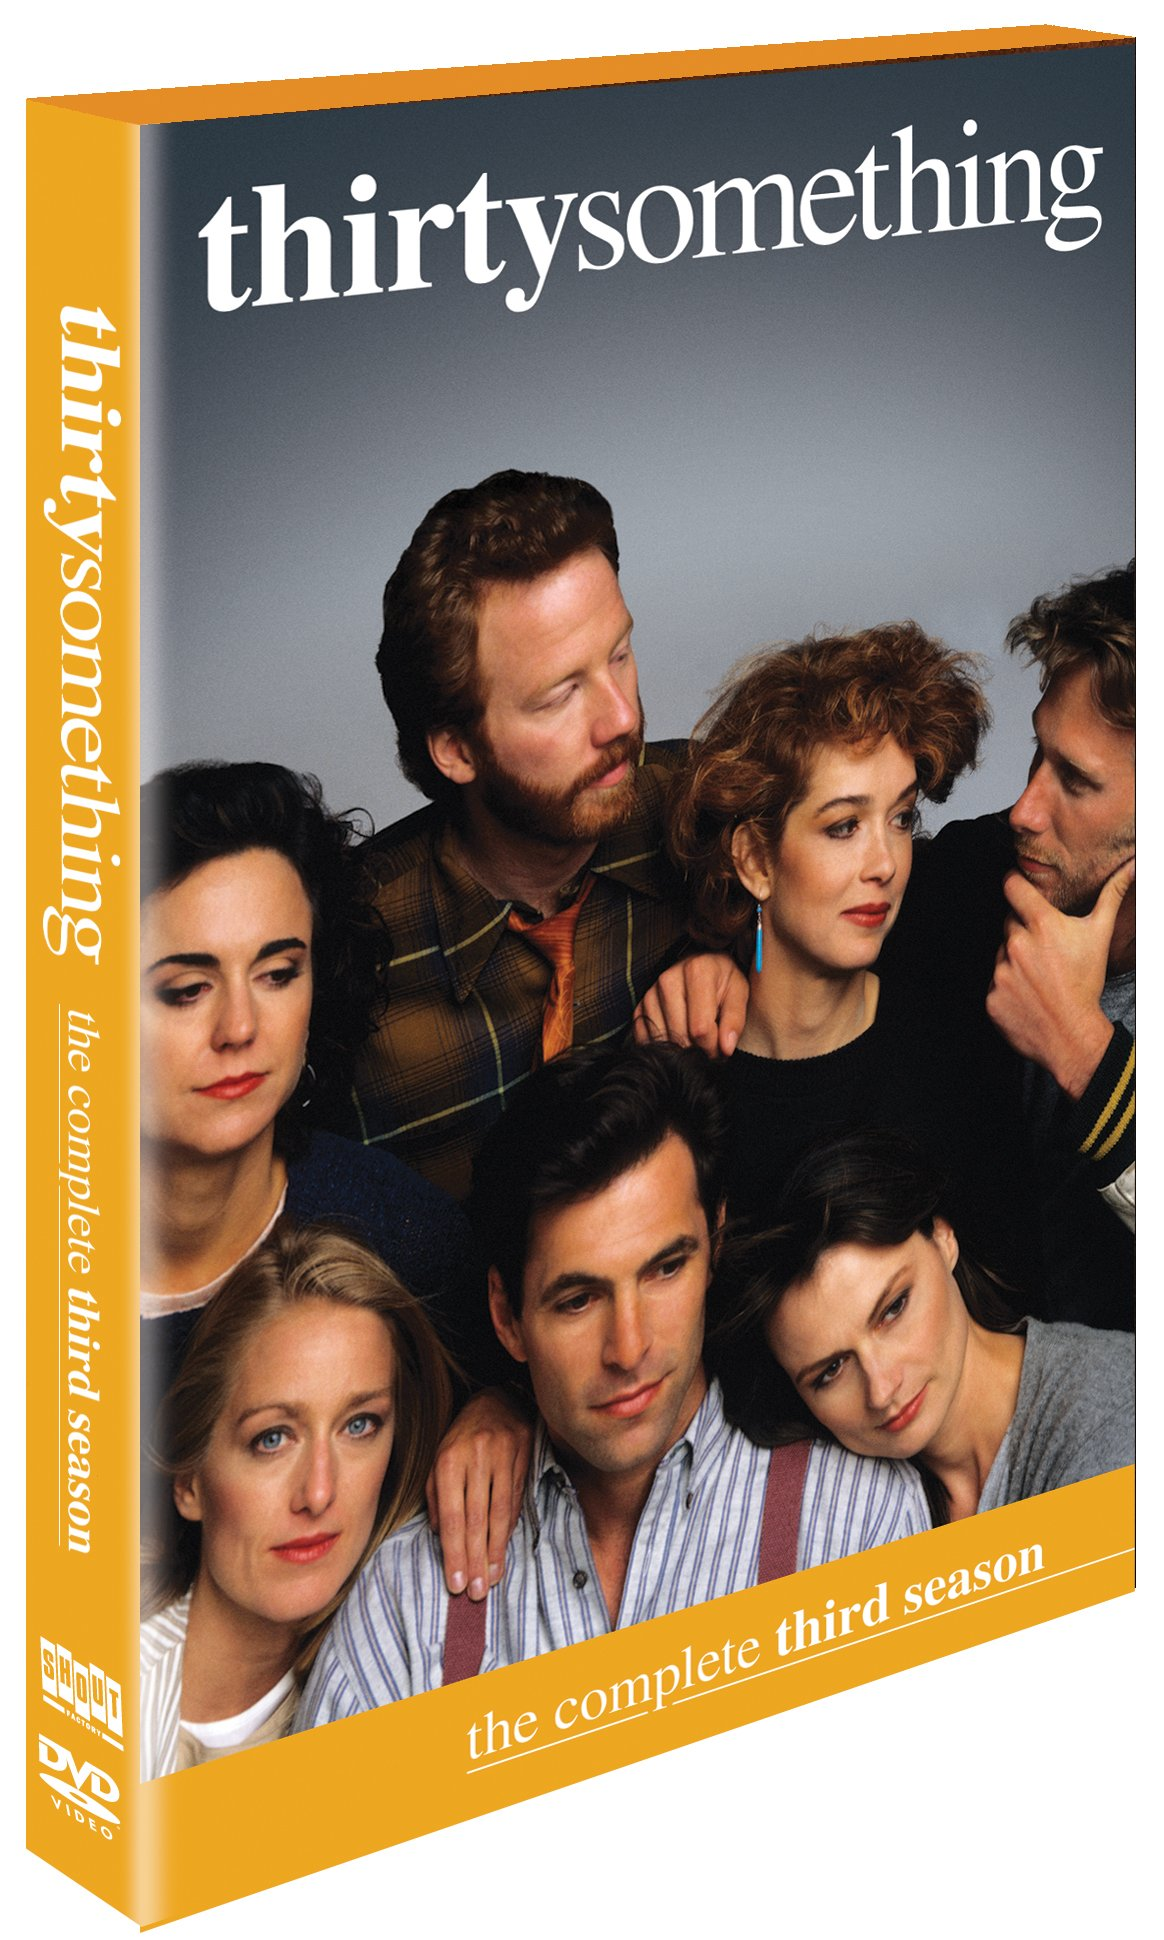 thirtysomething: Season 3